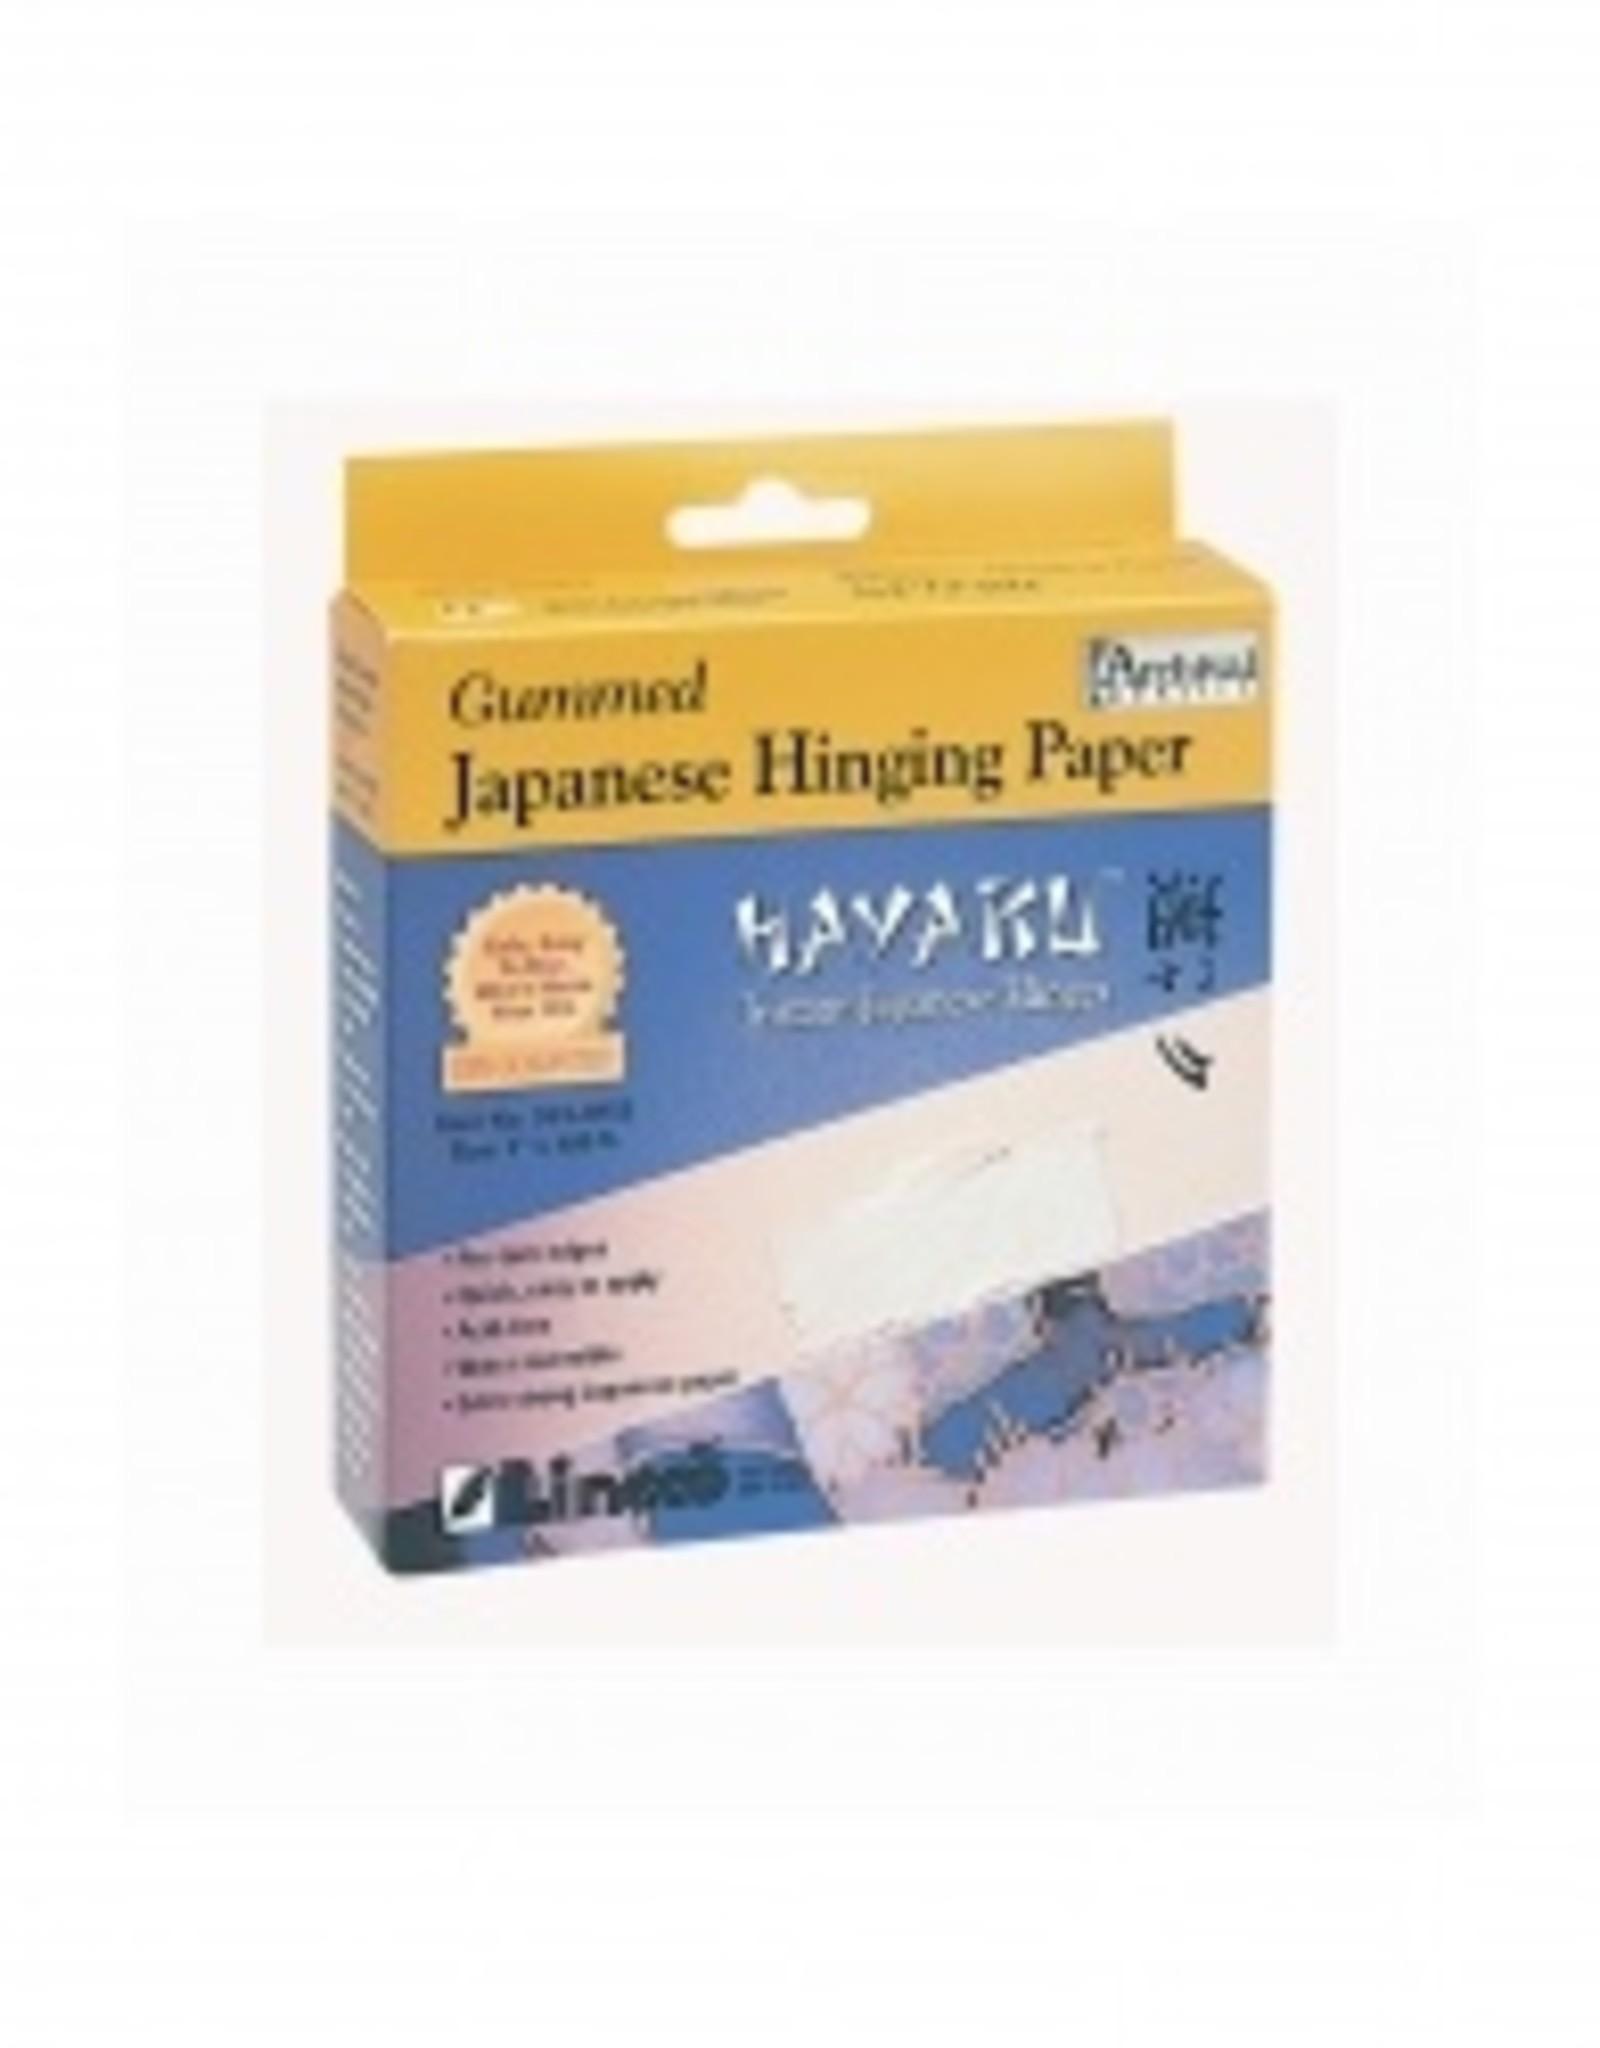 Hayaku Gompapier/ Gomtape Museumkwaliteit Zuurvrij voor ophangen tekeningen in passepartout 25mmx30m HAYAKU